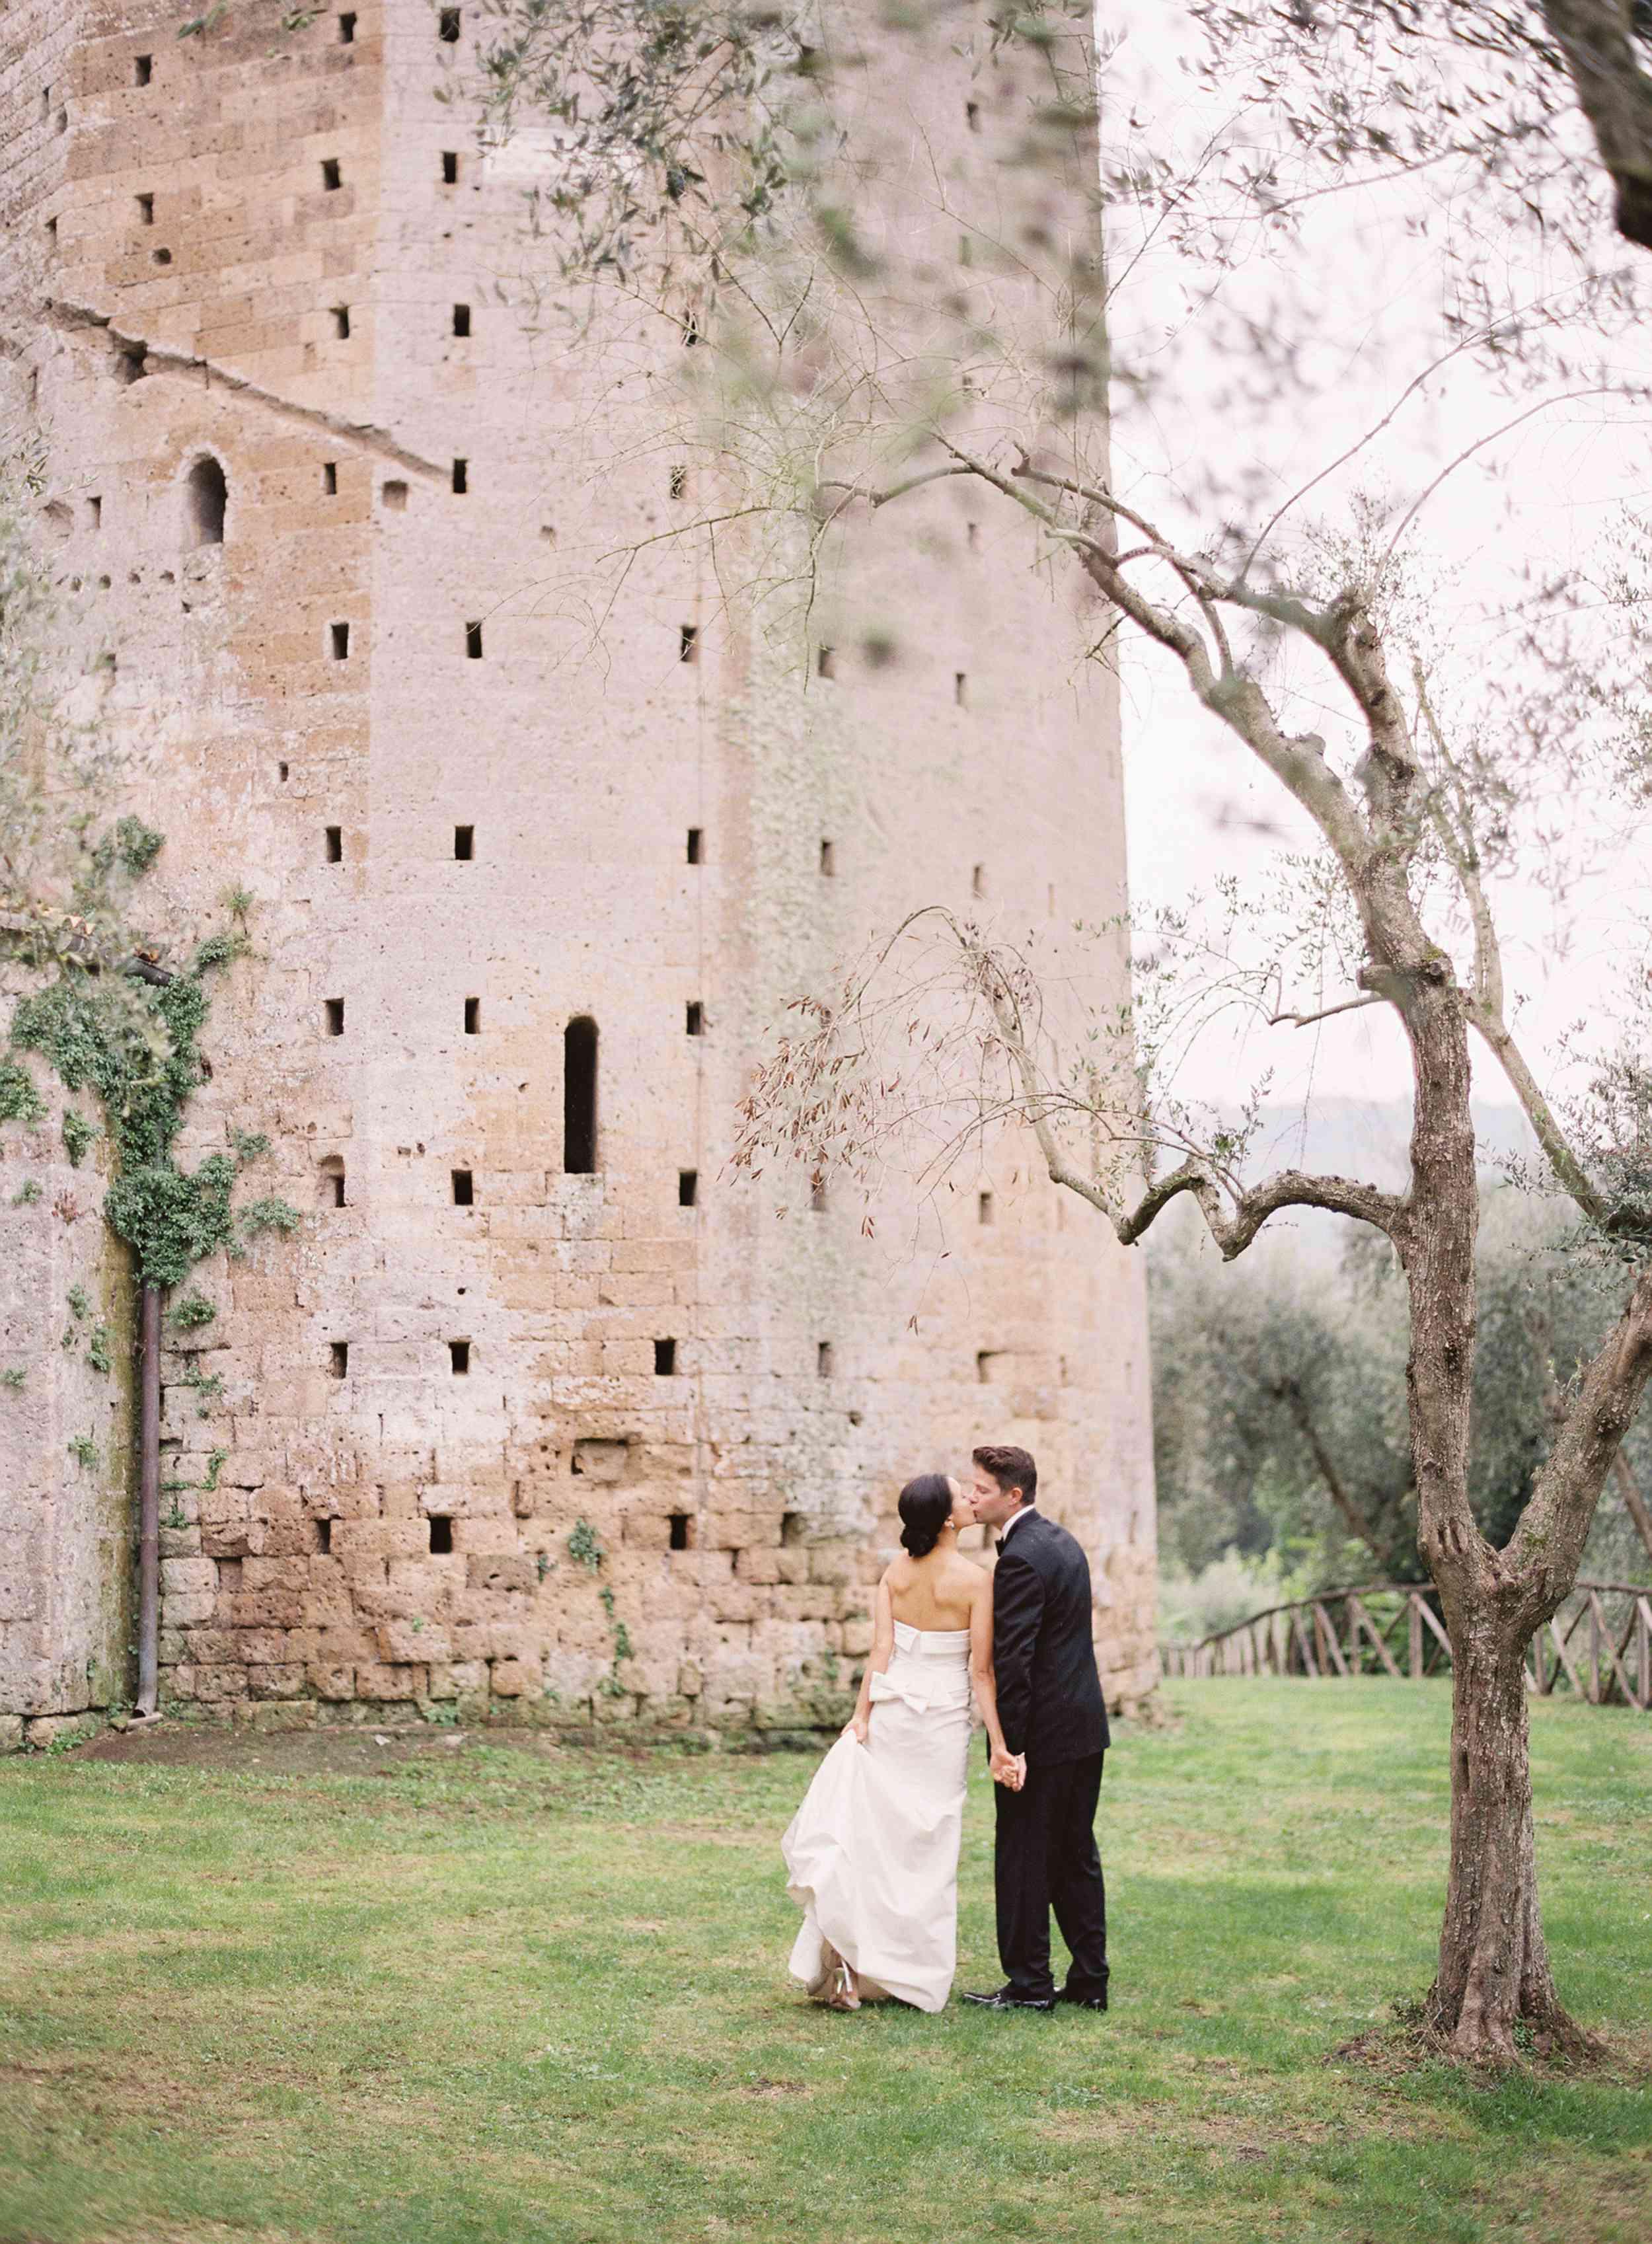 classic la badia italian wedding, bride and groom kissing outdoors